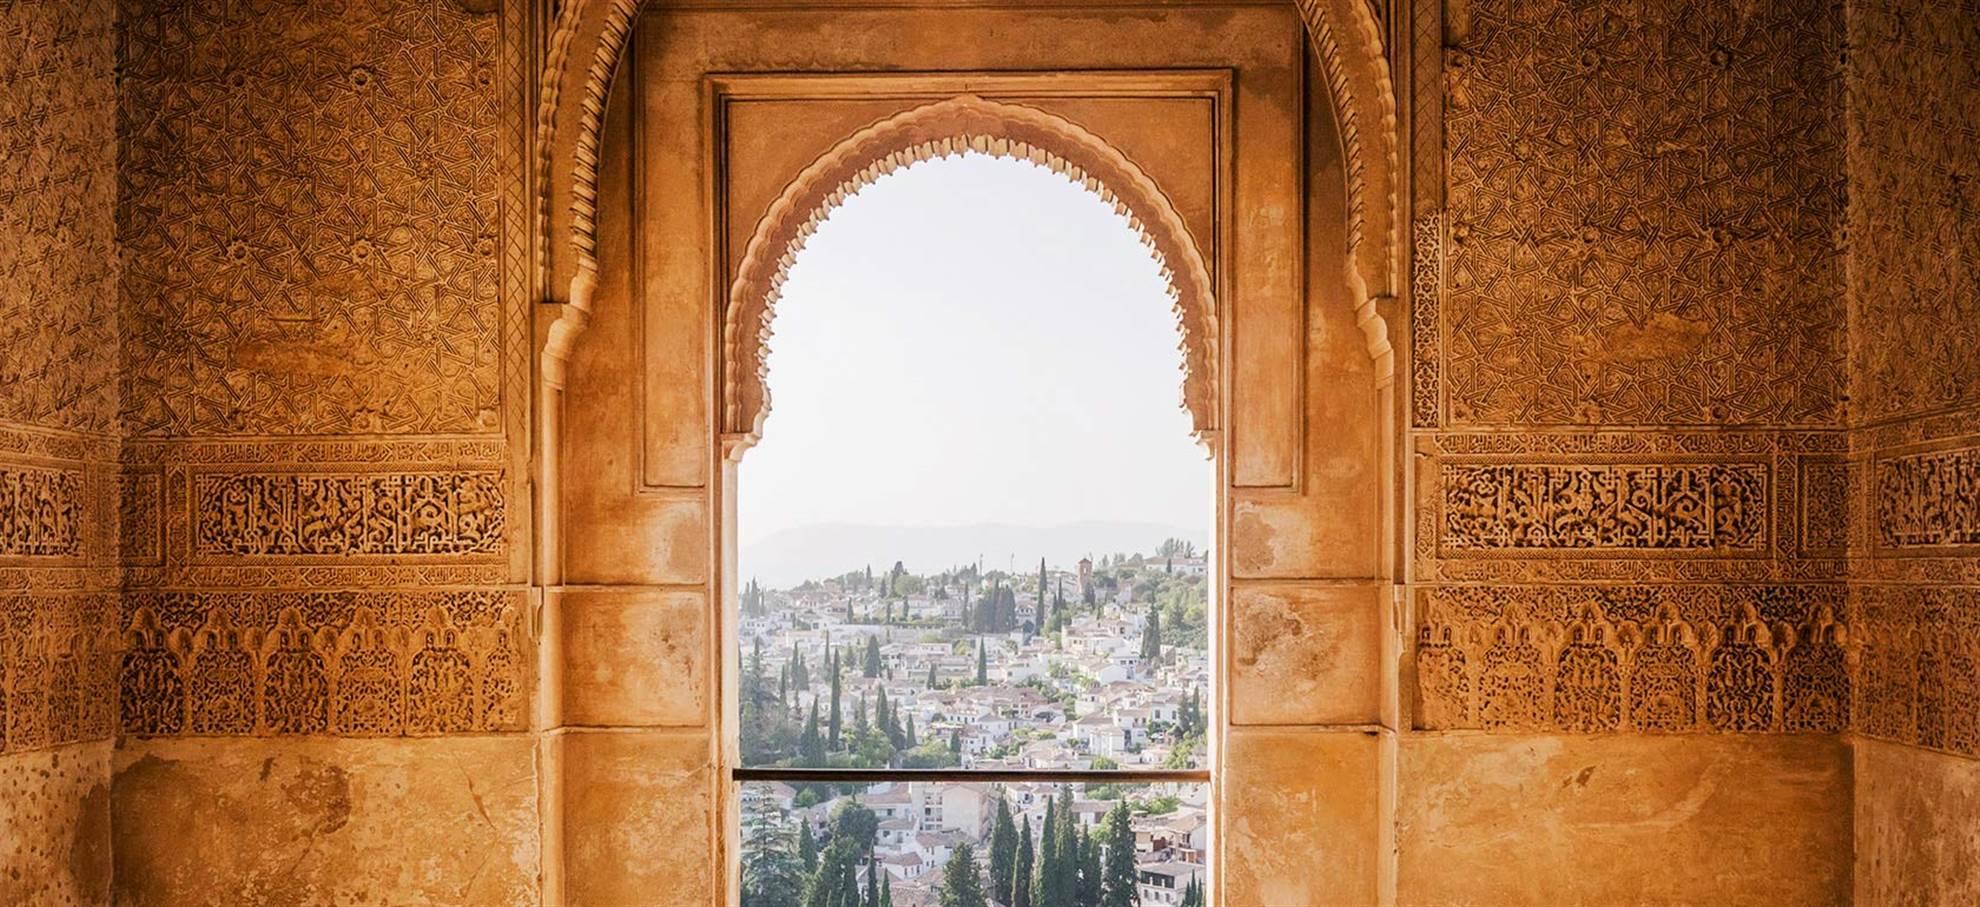 Карта Альгамбра - утренний визит (8:30) - Вход без очереди!